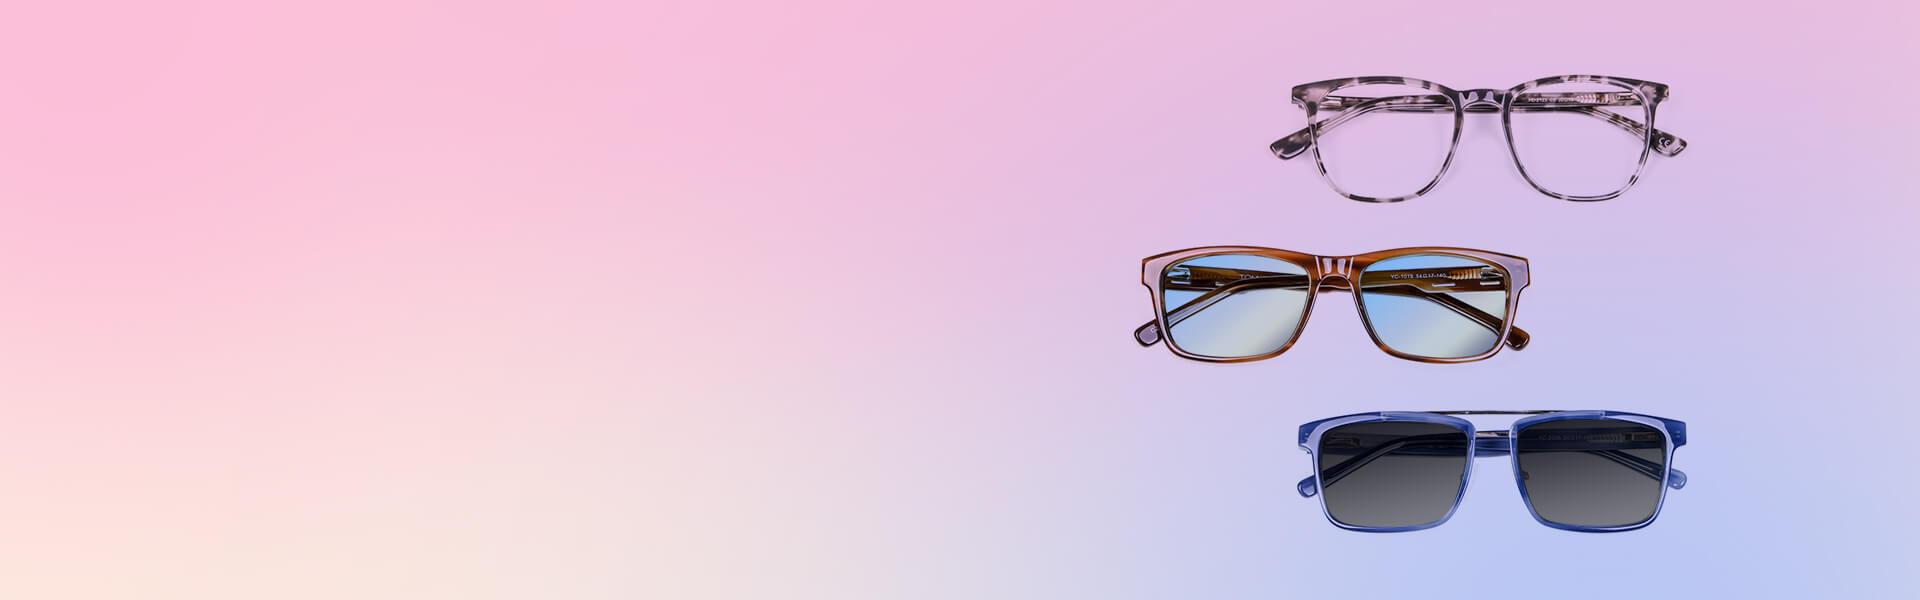 Specscart® Eyeglasses Lens 100% UV & Digital Protection UK